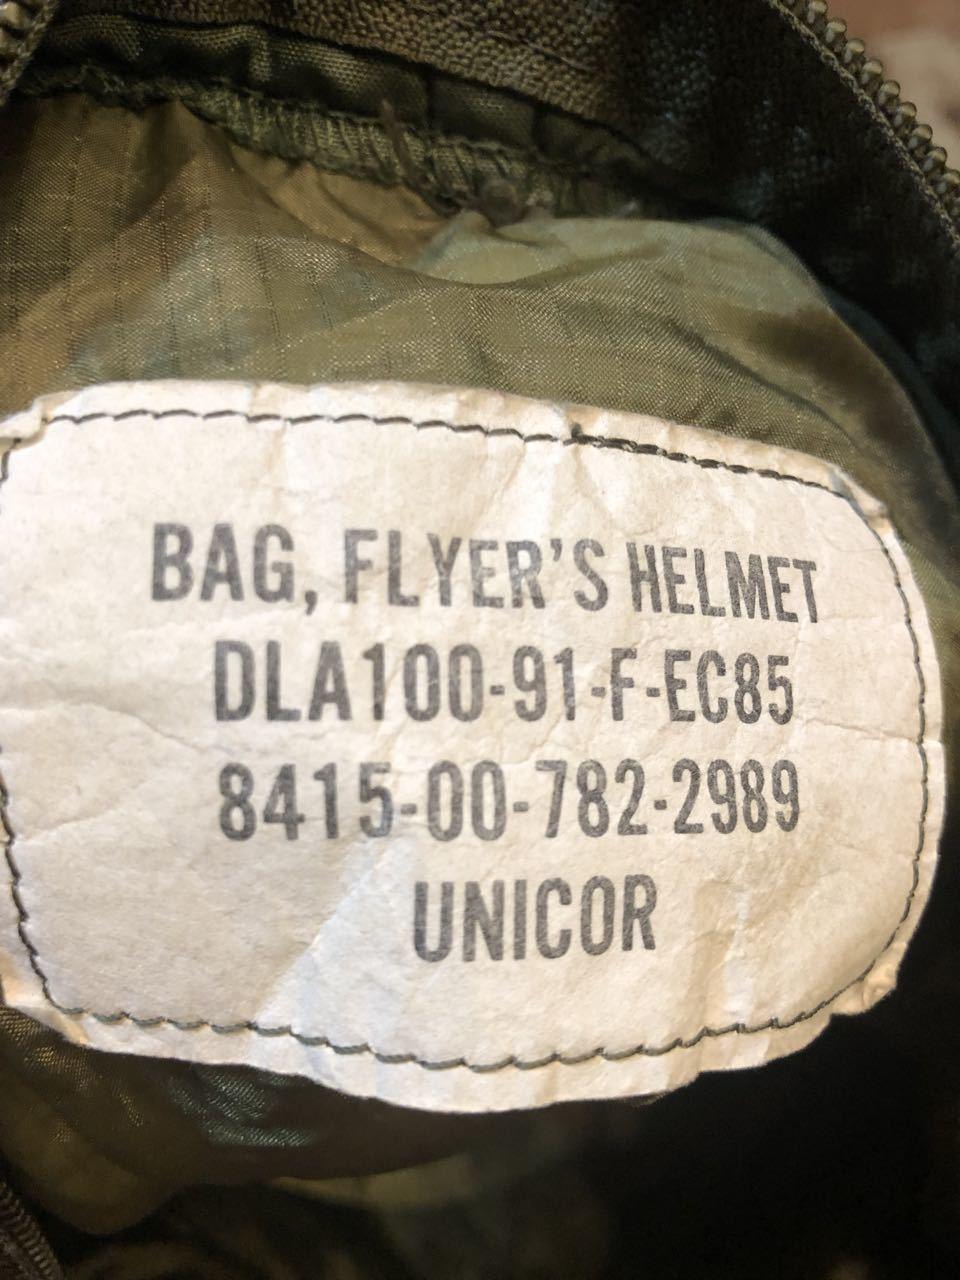 U.S.A.F 実物 ヘルメットバッグ!!_c0144020_14290374.jpg